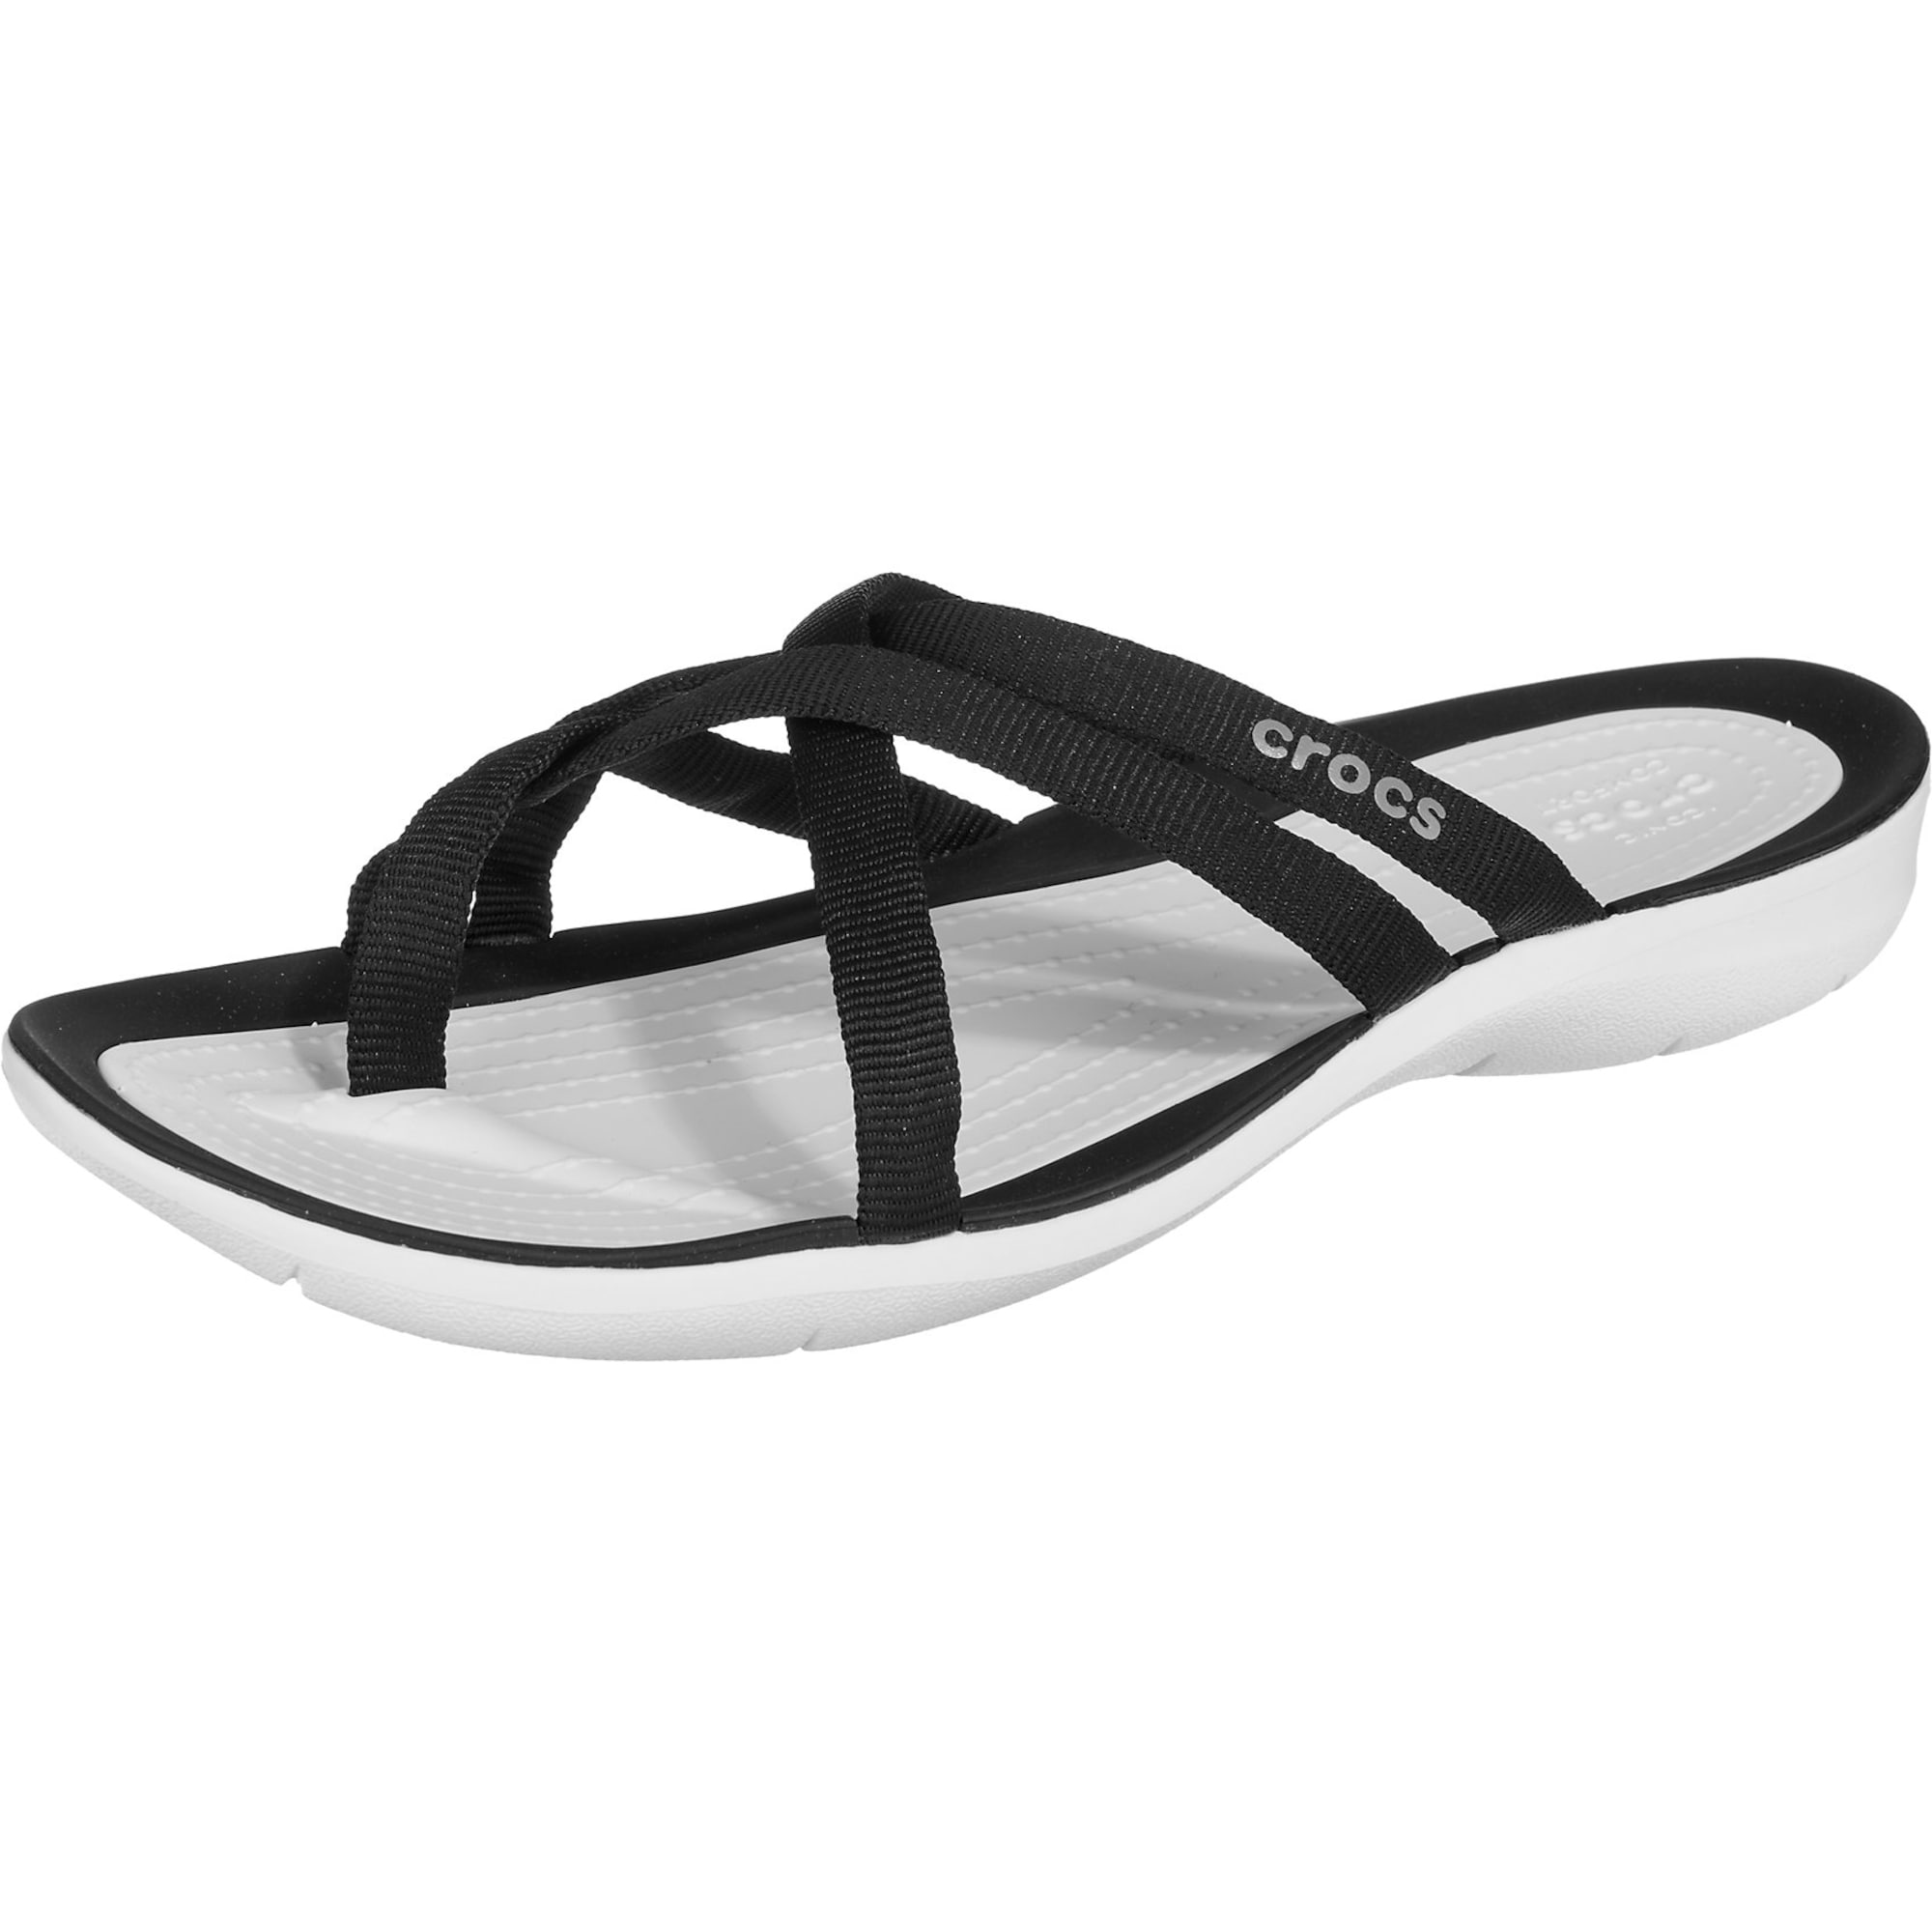 Zehentrenner 'Swiftwater' | Schuhe > Sandalen & Zehentrenner > Zehentrenner | Schwarz - Weiß | Crocs